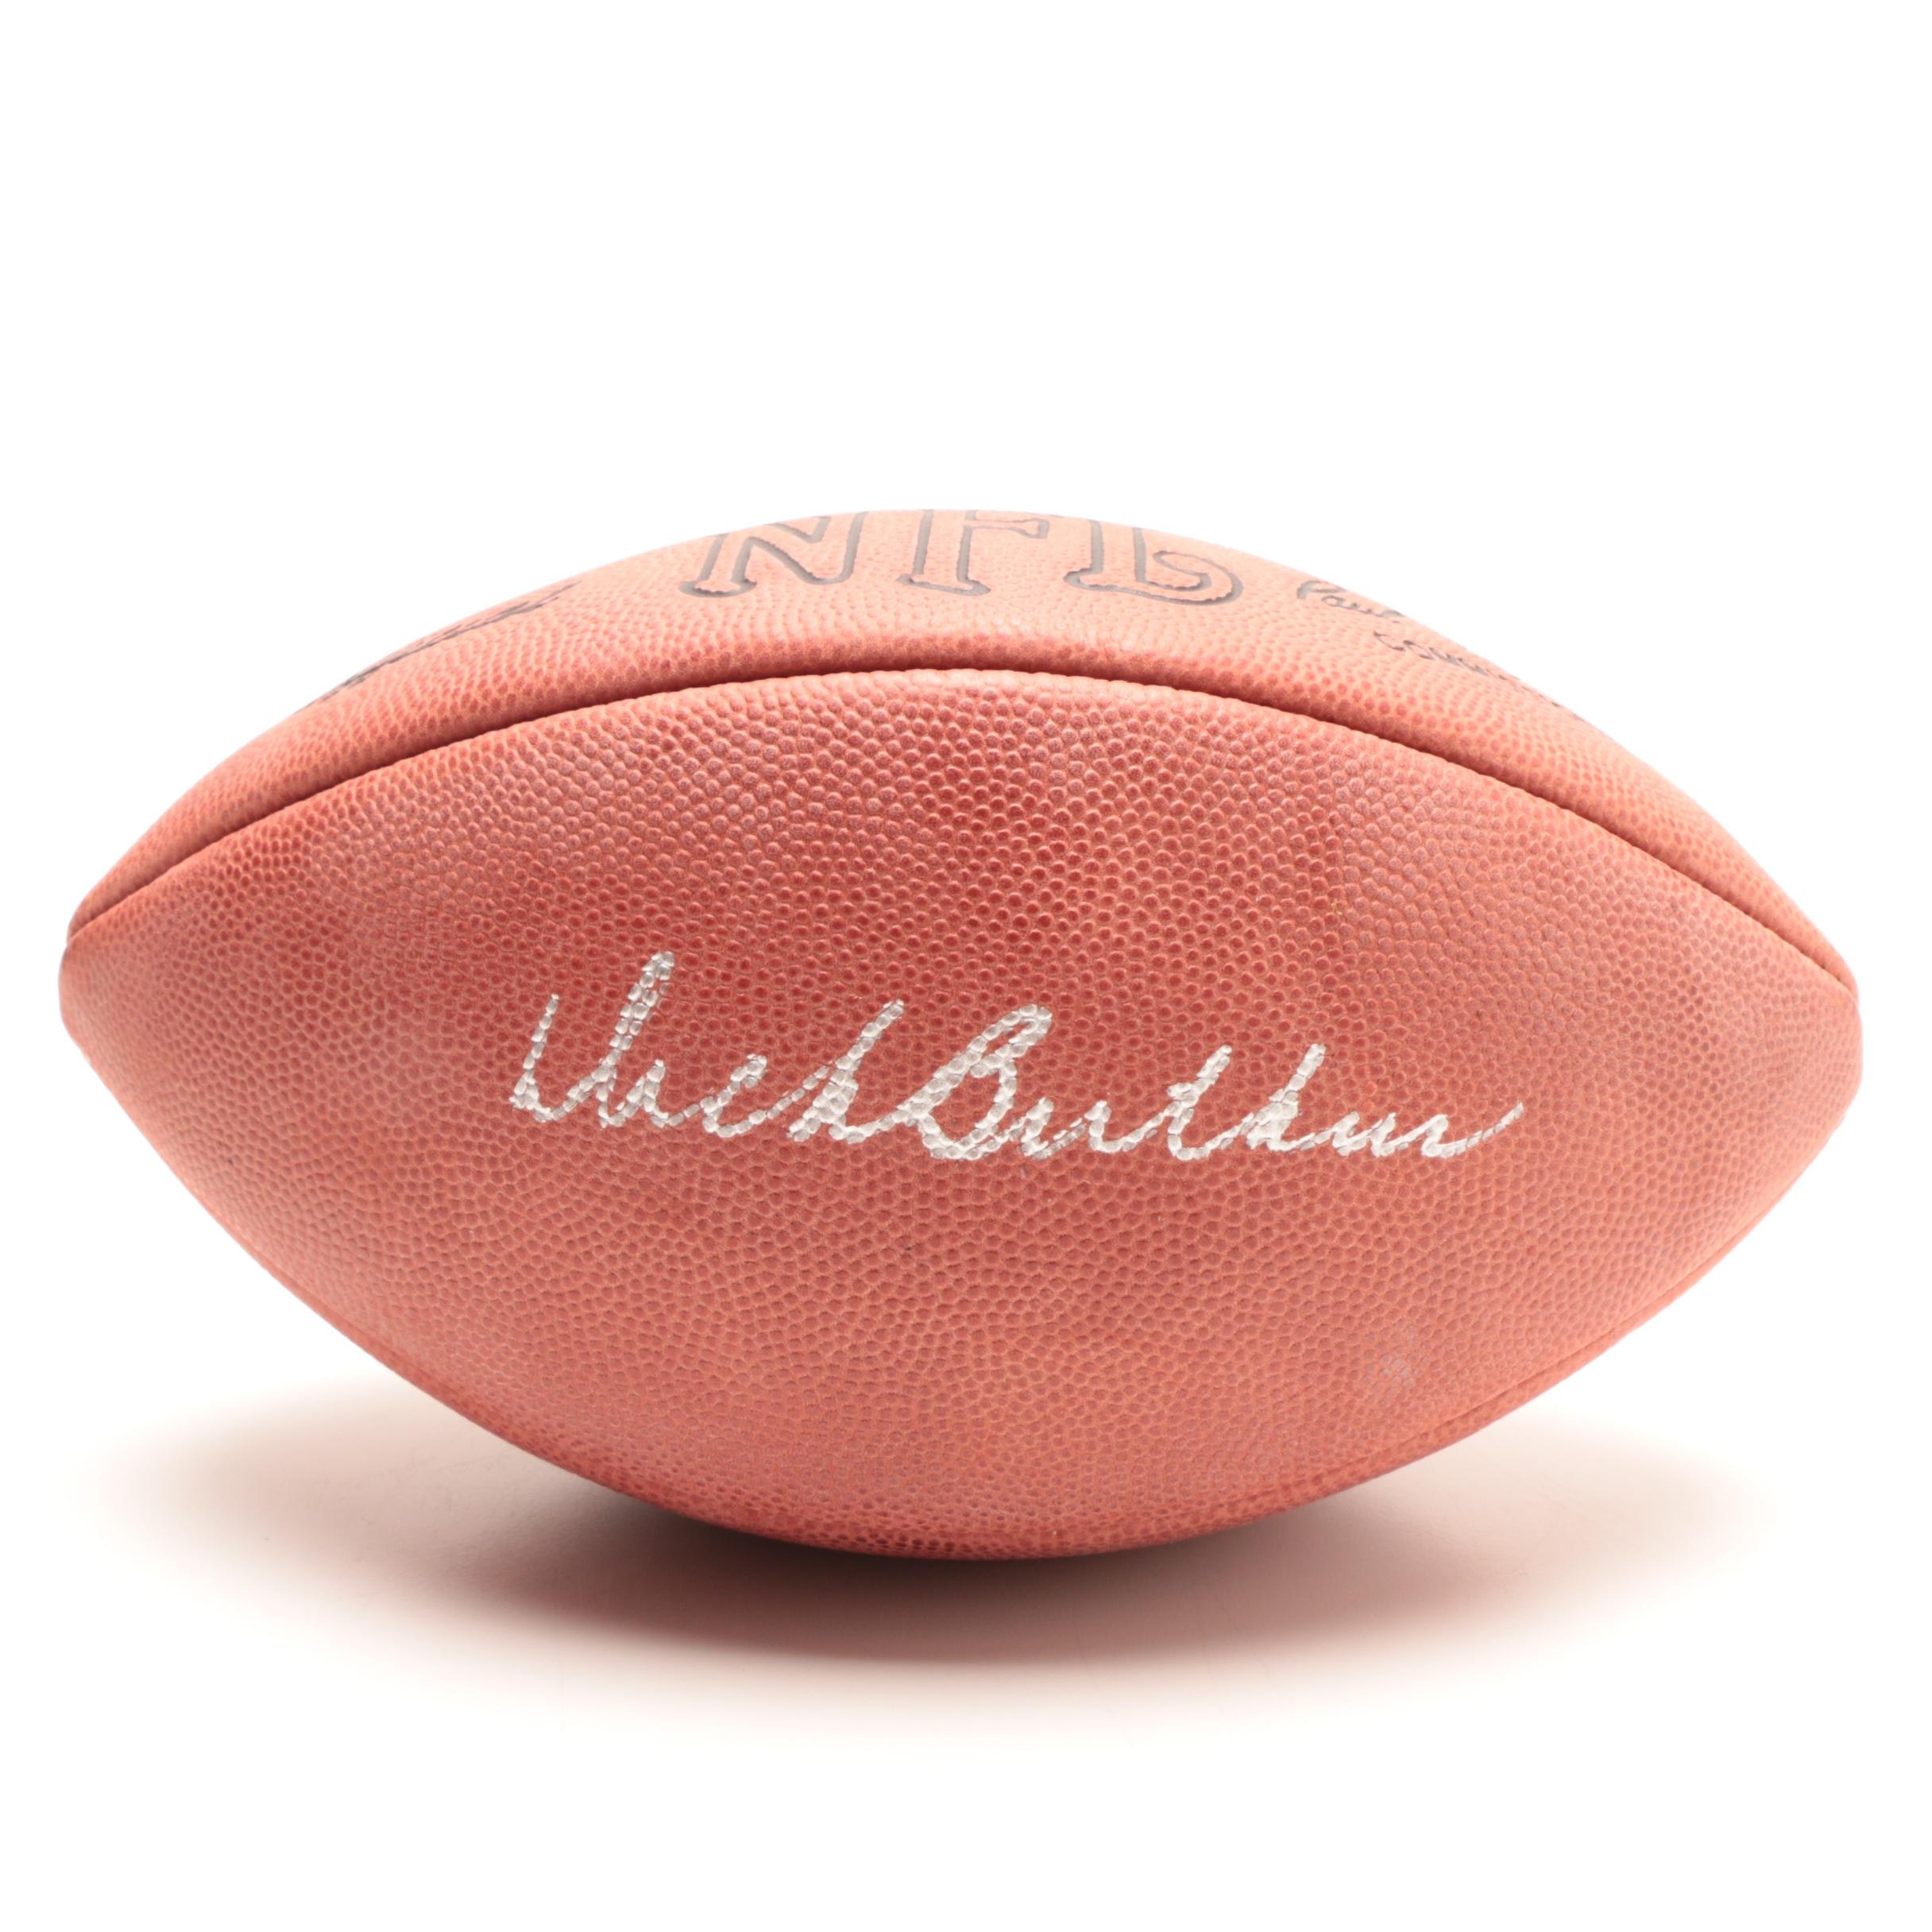 Dick Butkus Signed Football  COA